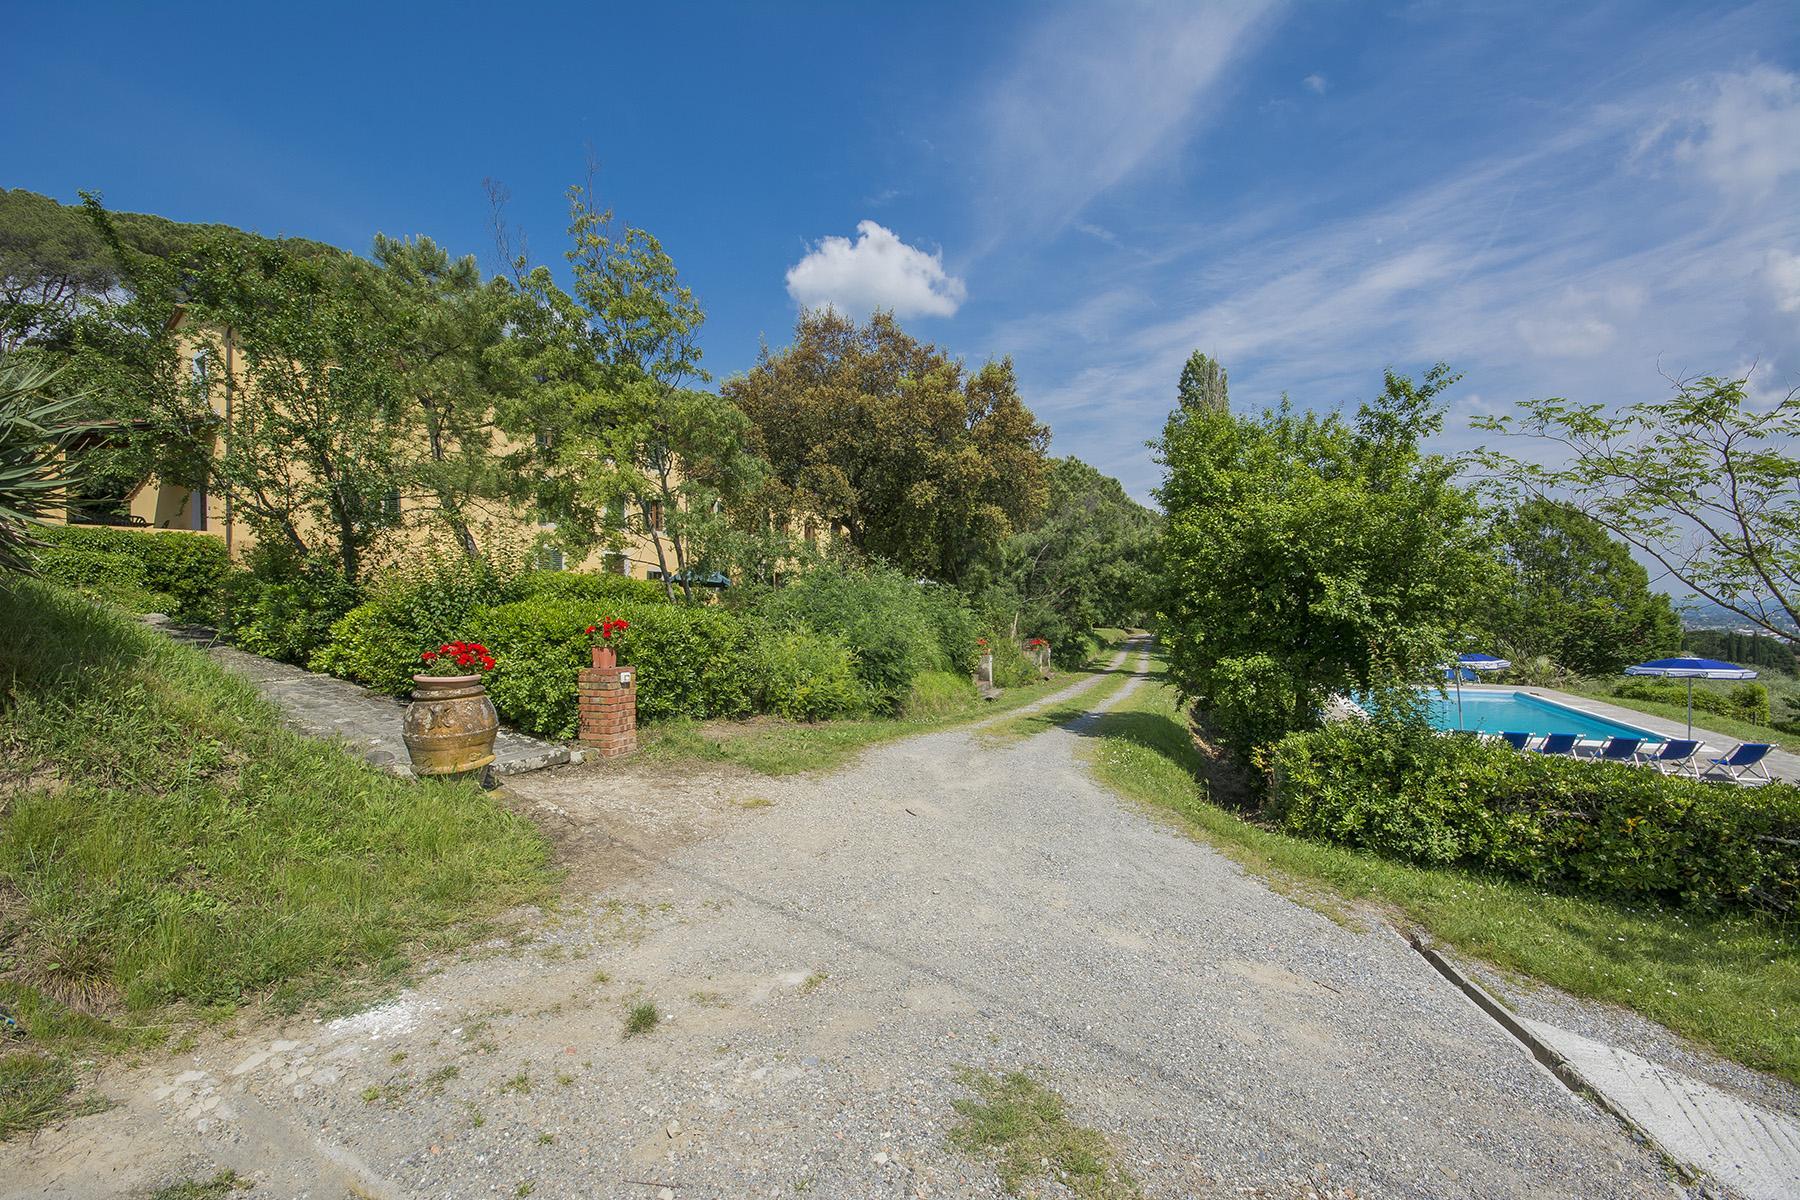 Pescia小山丘上美丽的乡间农舍 - 32